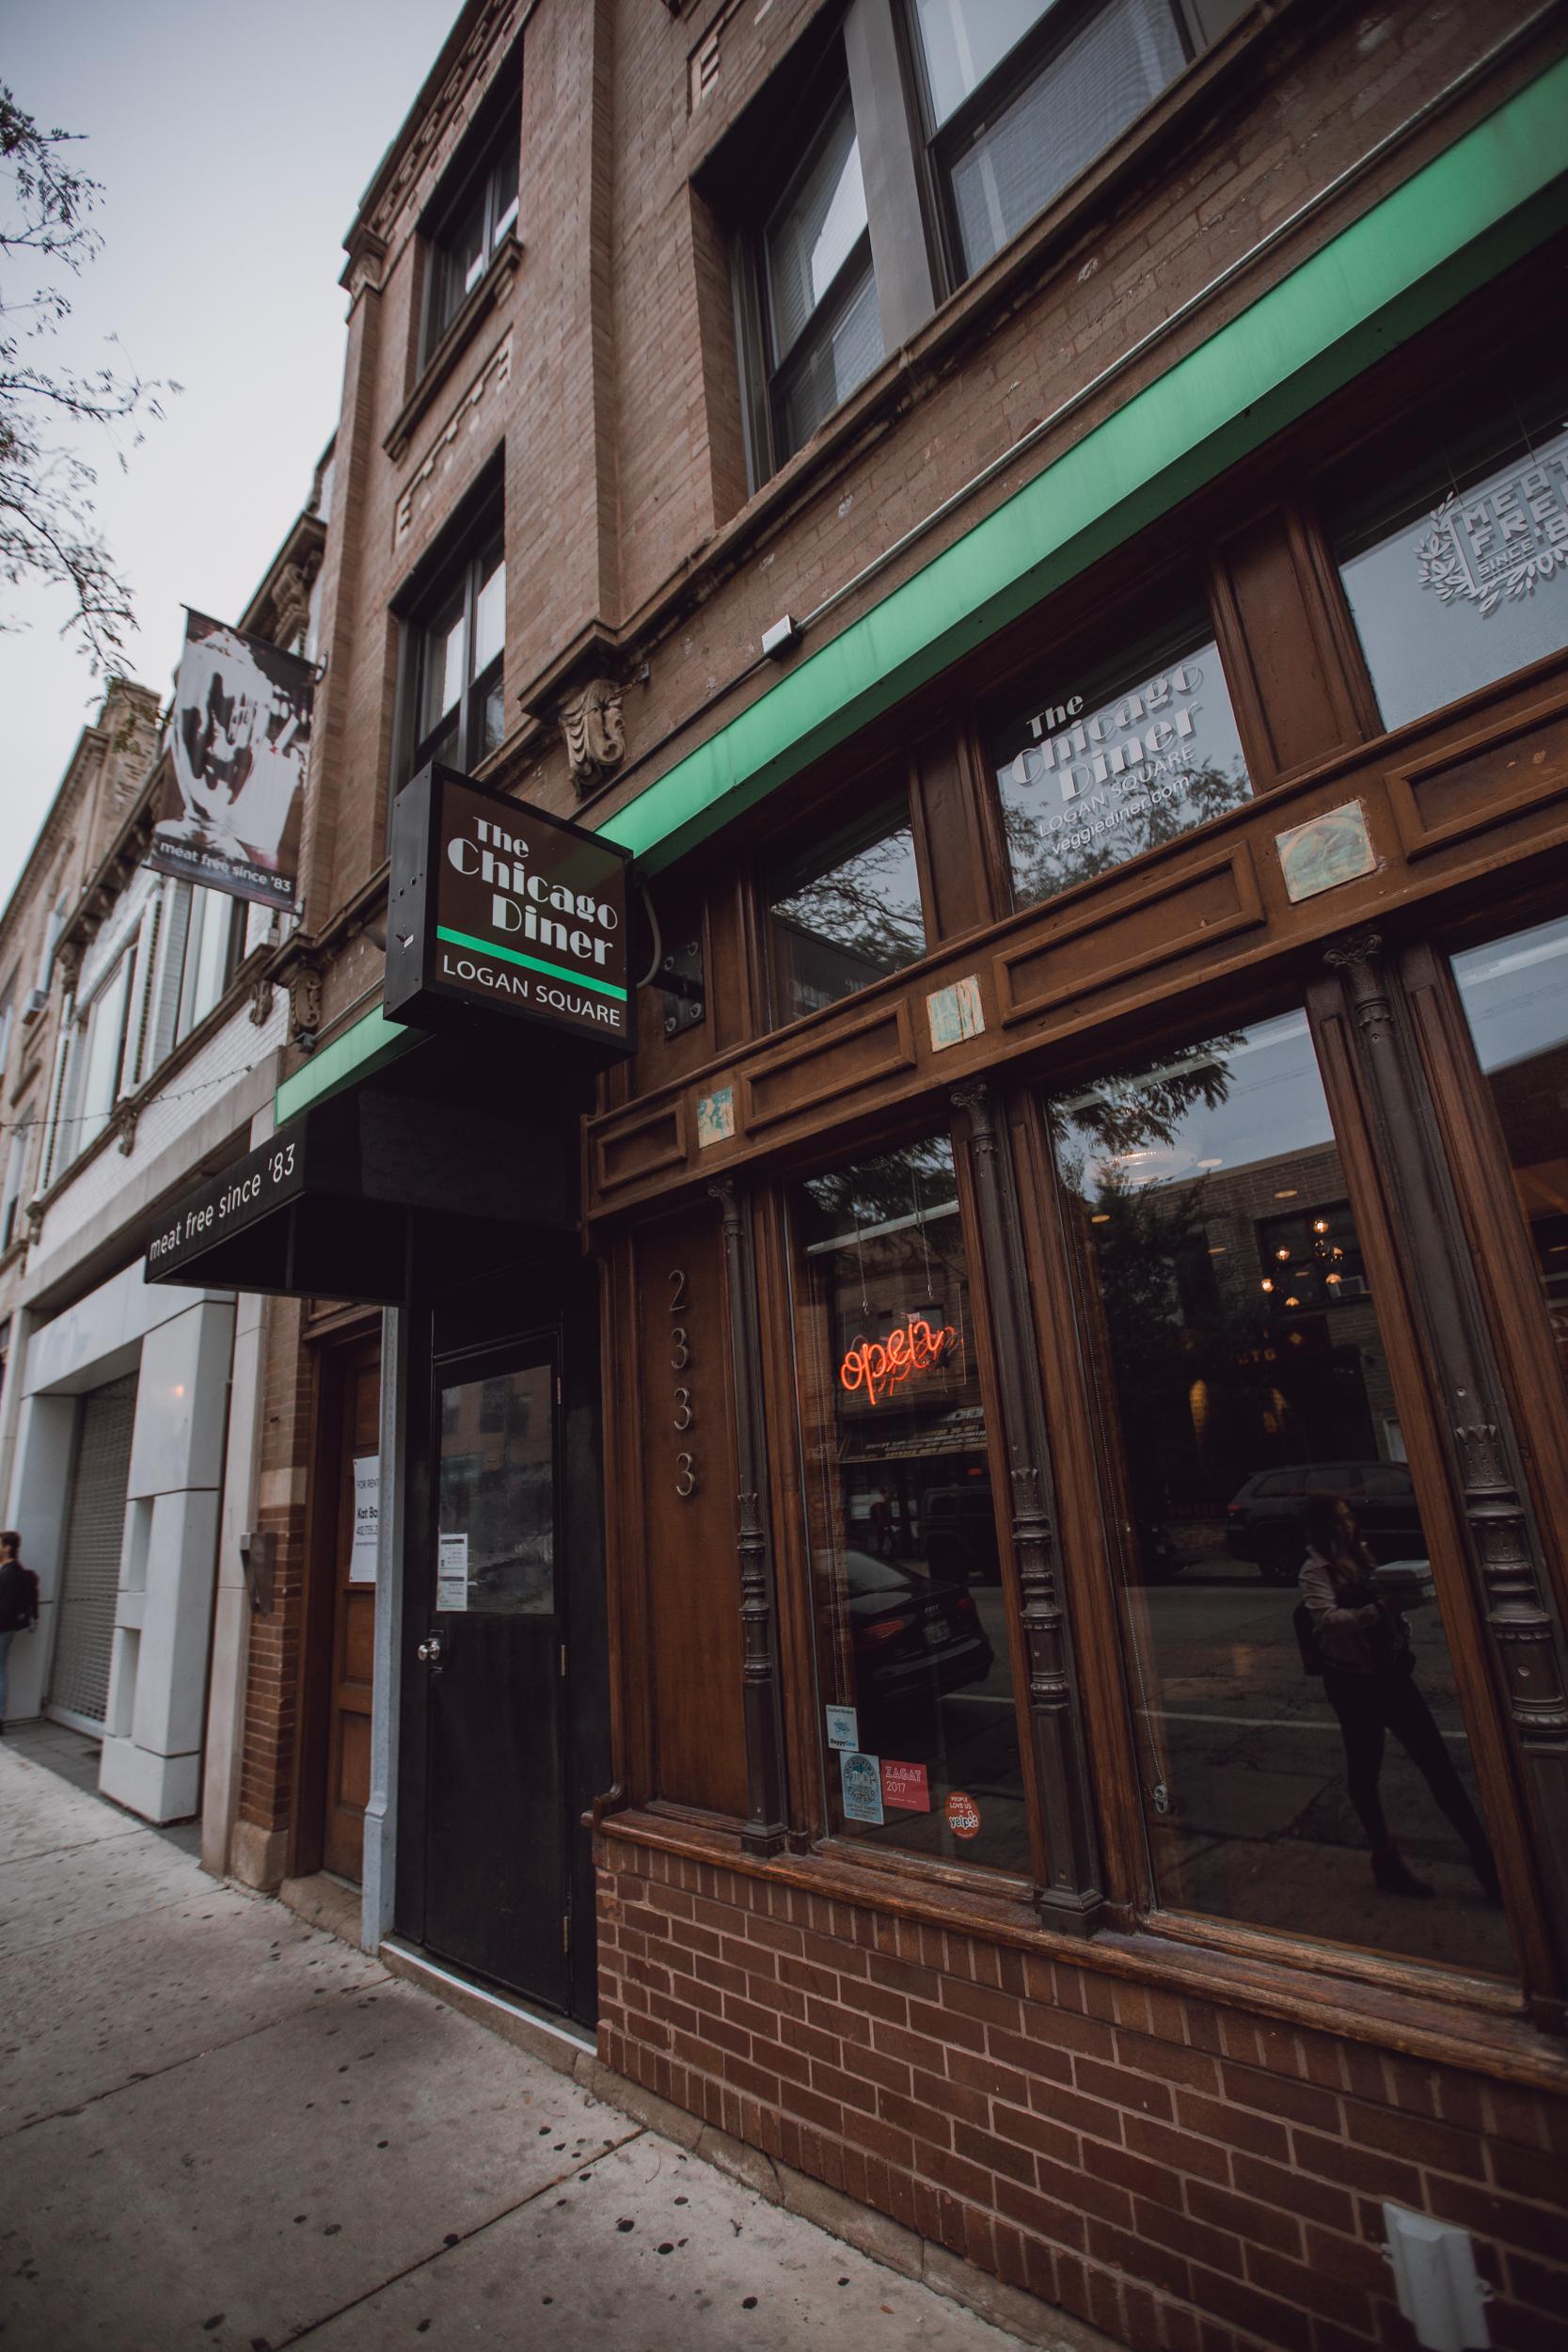 vegan diner chicago, Chicago Restaurant, the chicago diner, meat free since '83, french fries in chicago, putine fries in chicago, vegan food in chicago-www.rachelsmak.com10.jpg